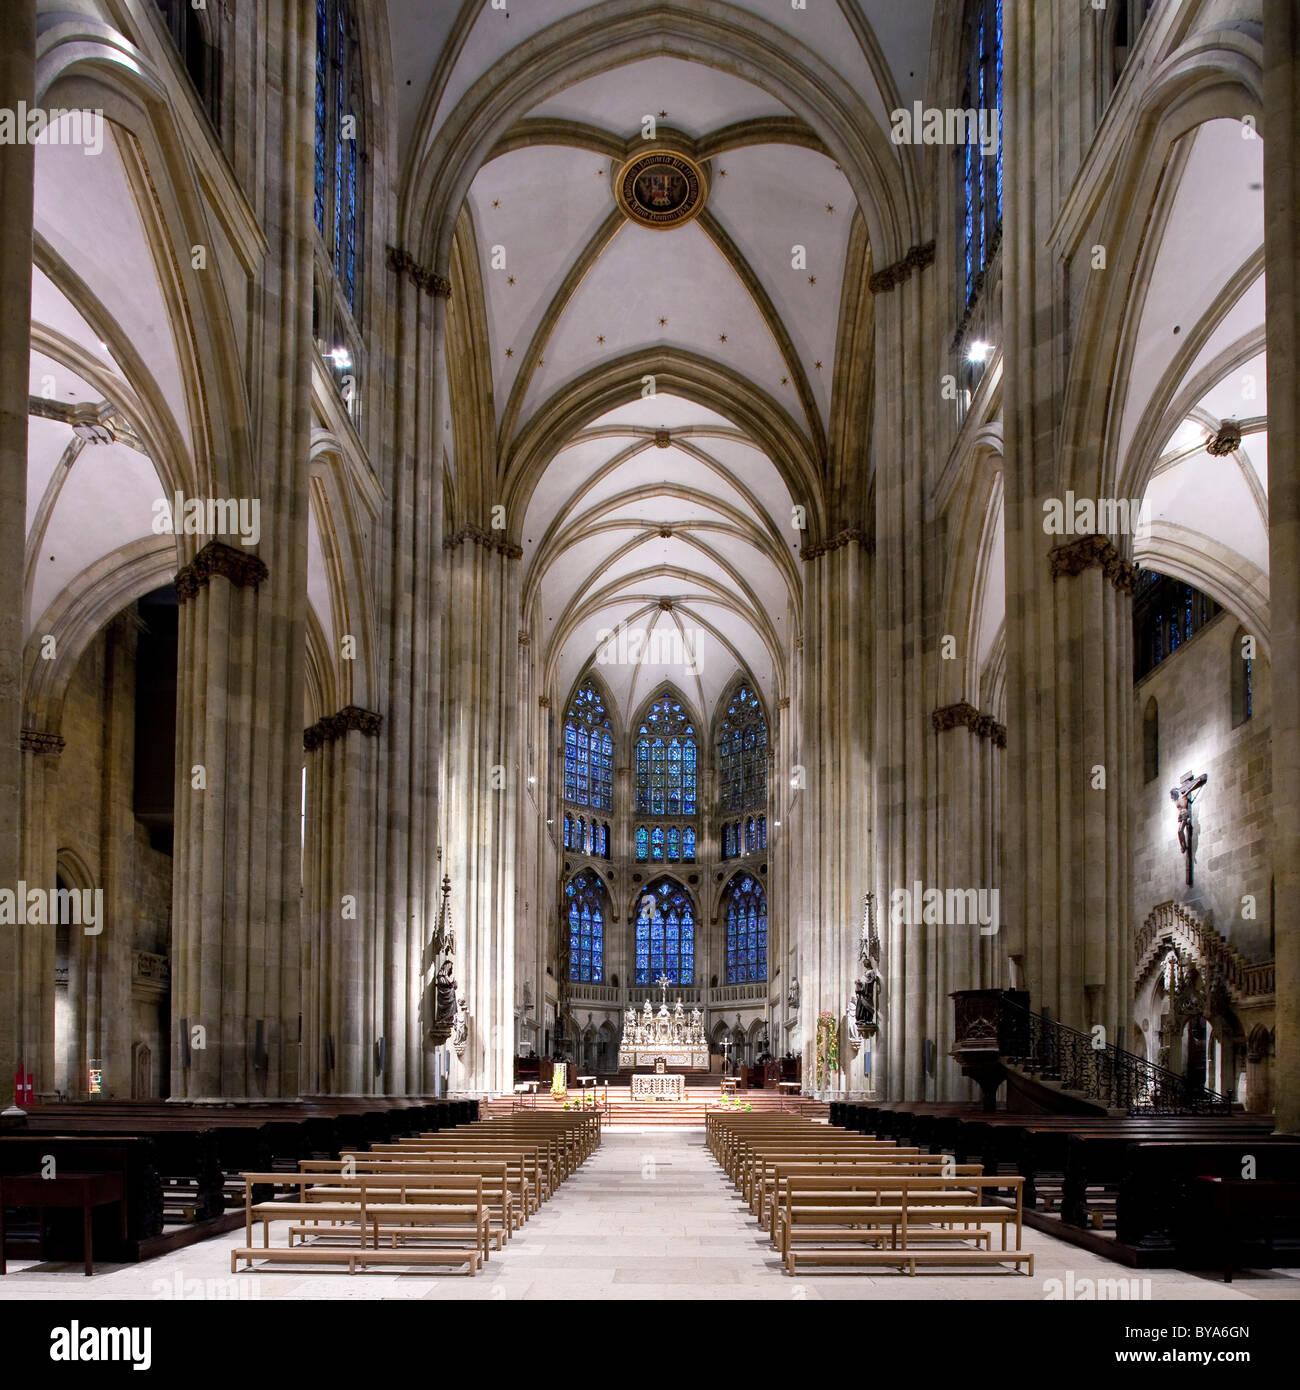 interior regensburg cathedral unesco world heritage site stock photo royalty free image. Black Bedroom Furniture Sets. Home Design Ideas